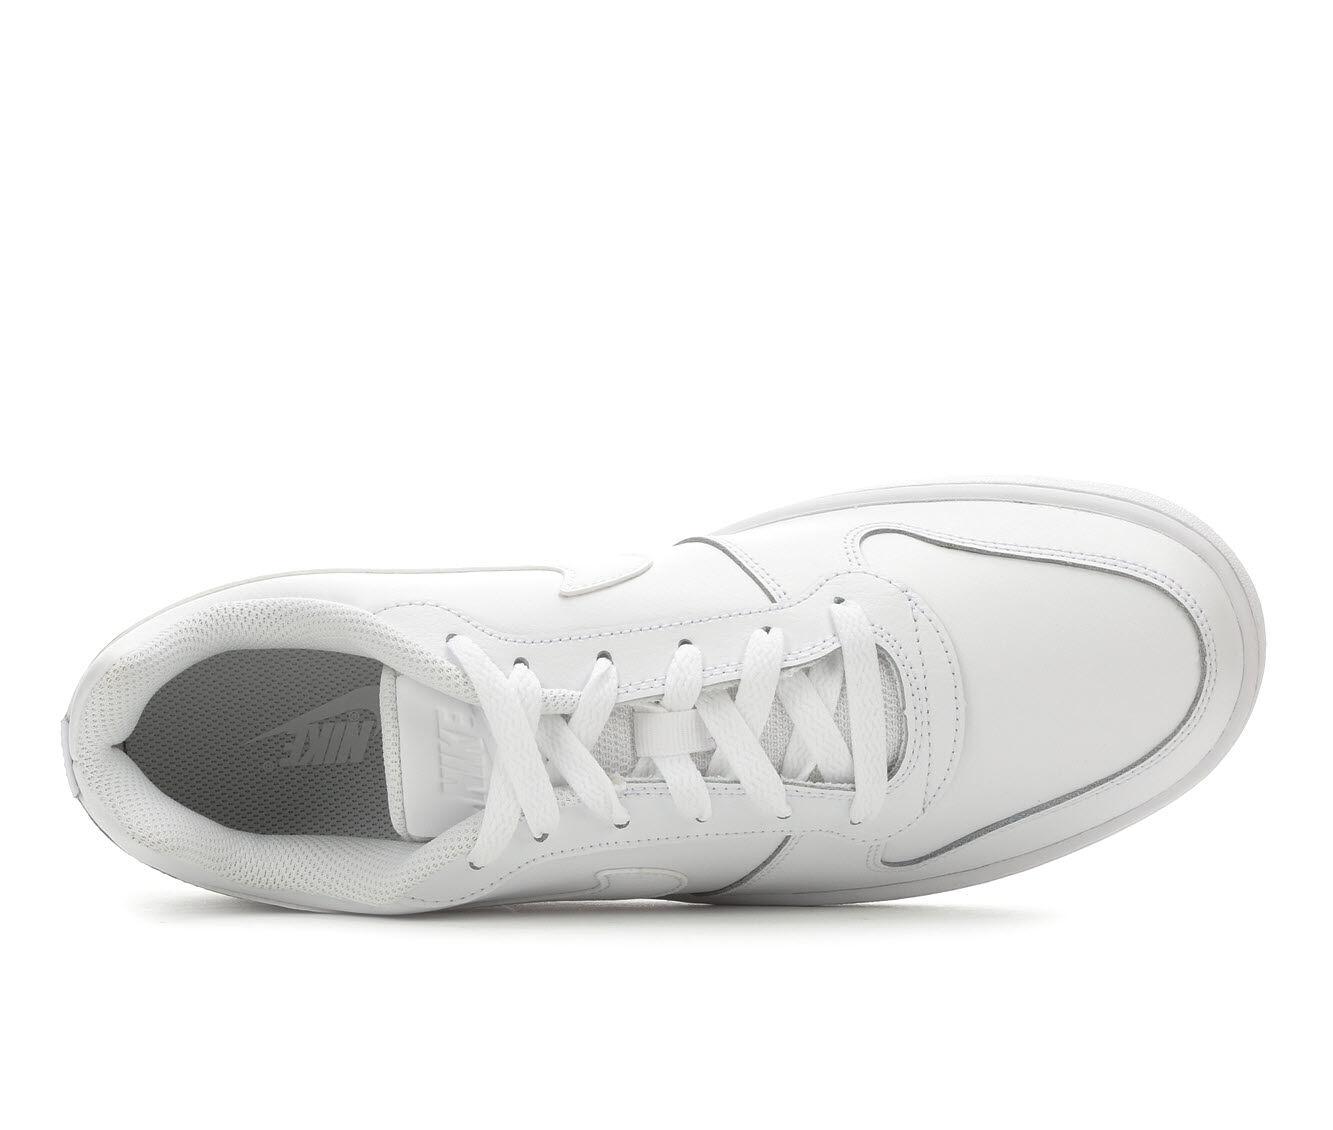 Men's Nike Ebernon Low Sneakers